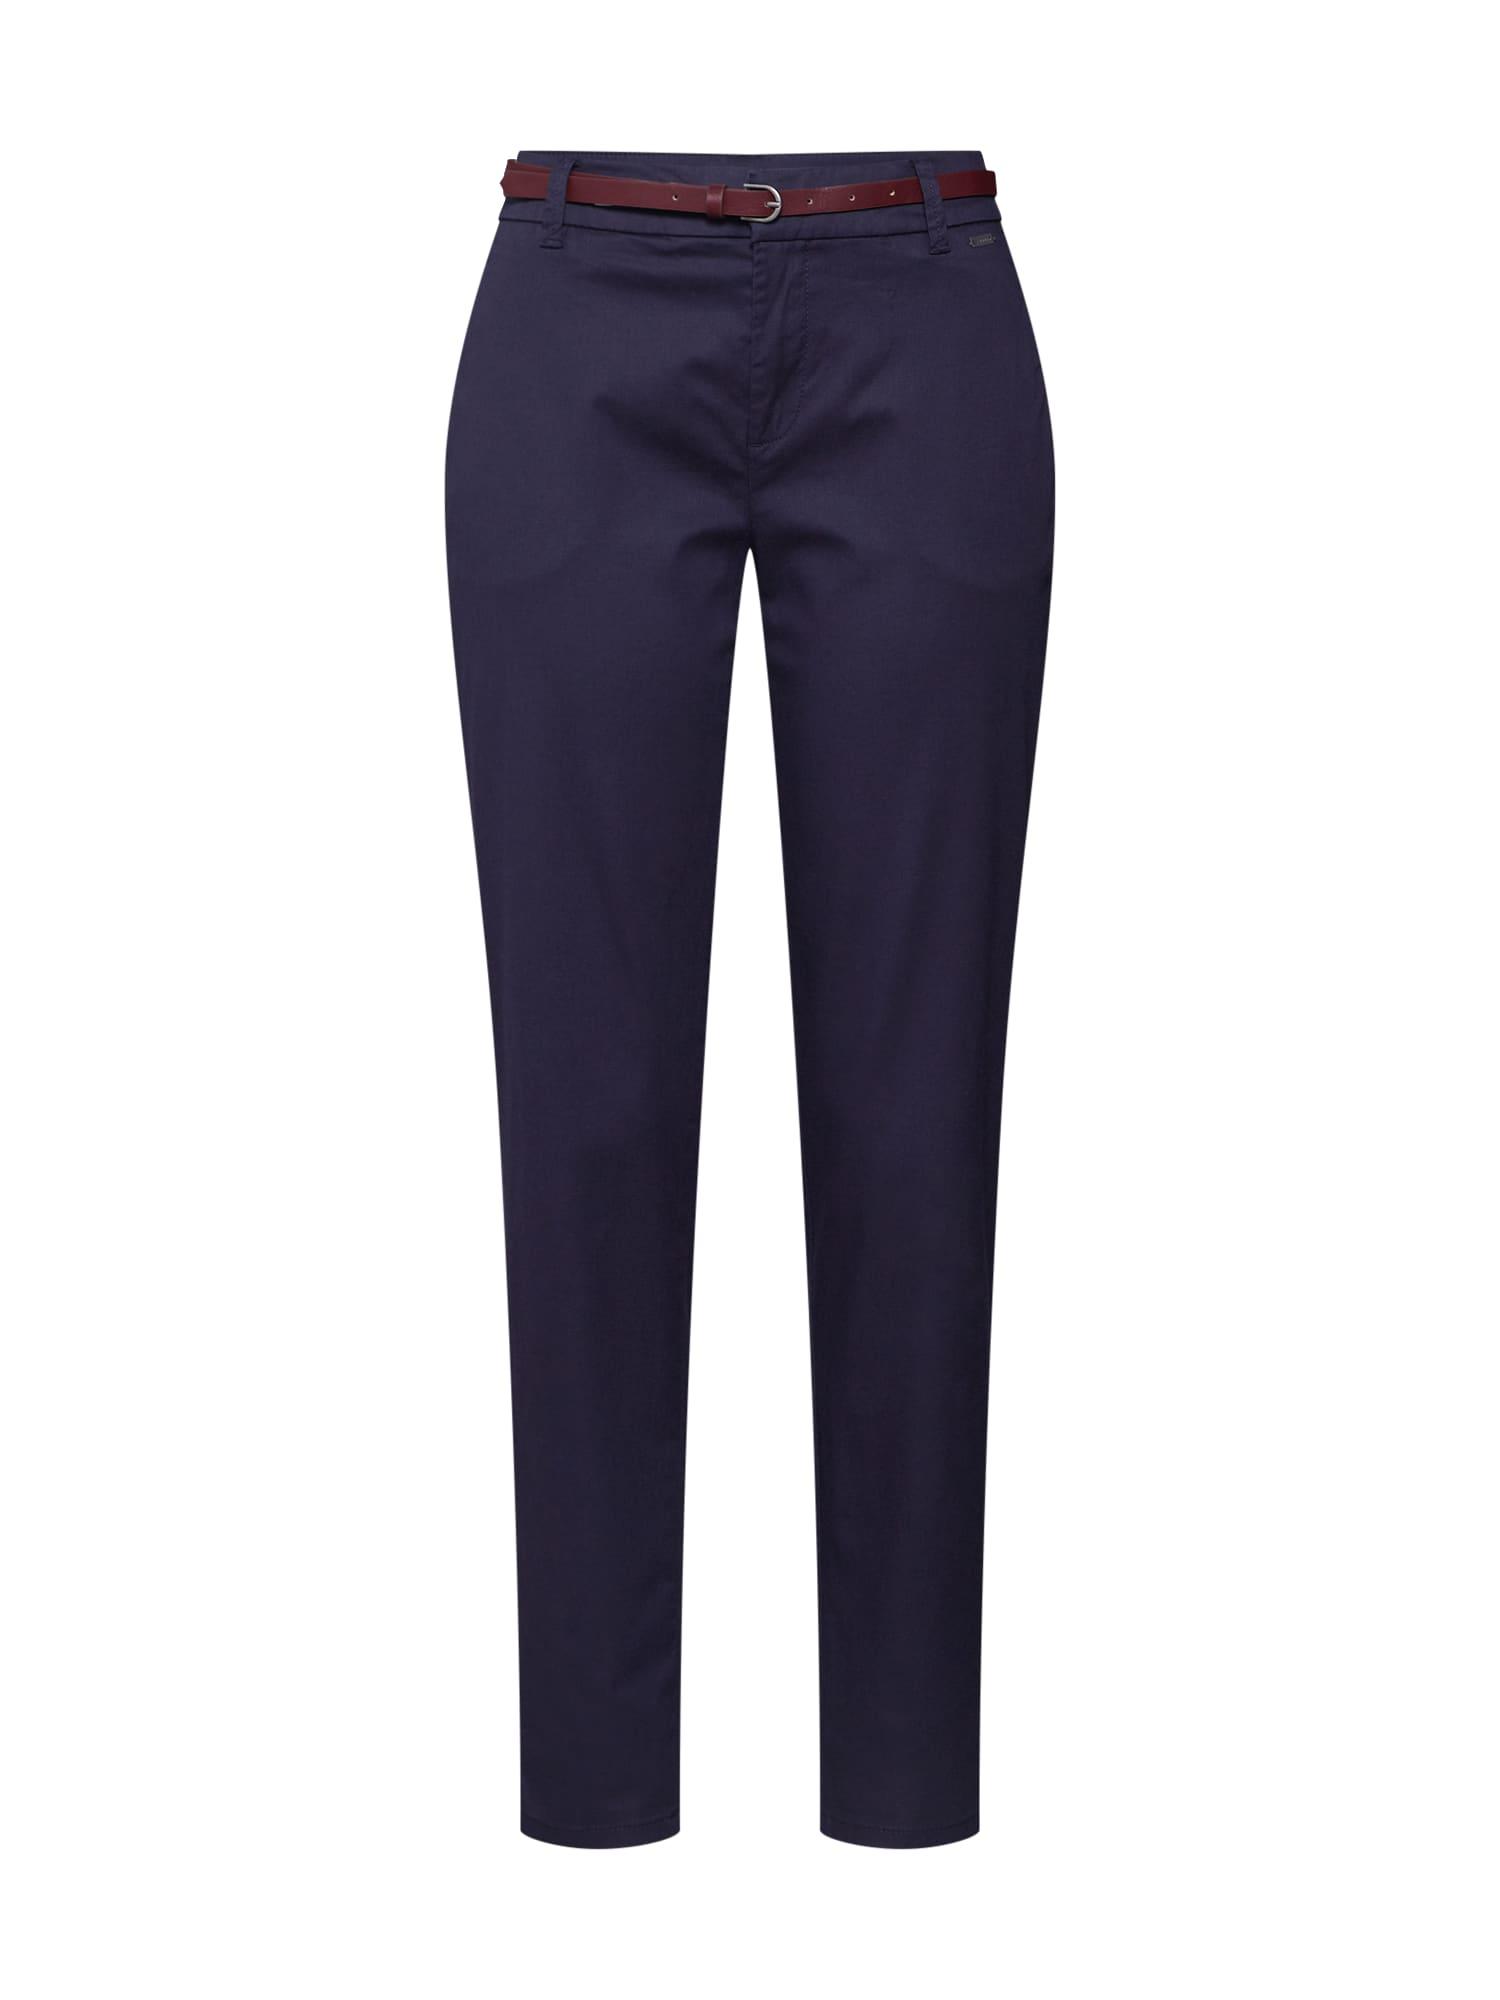 Chino kalhoty Chino Slim námořnická modř ESPRIT